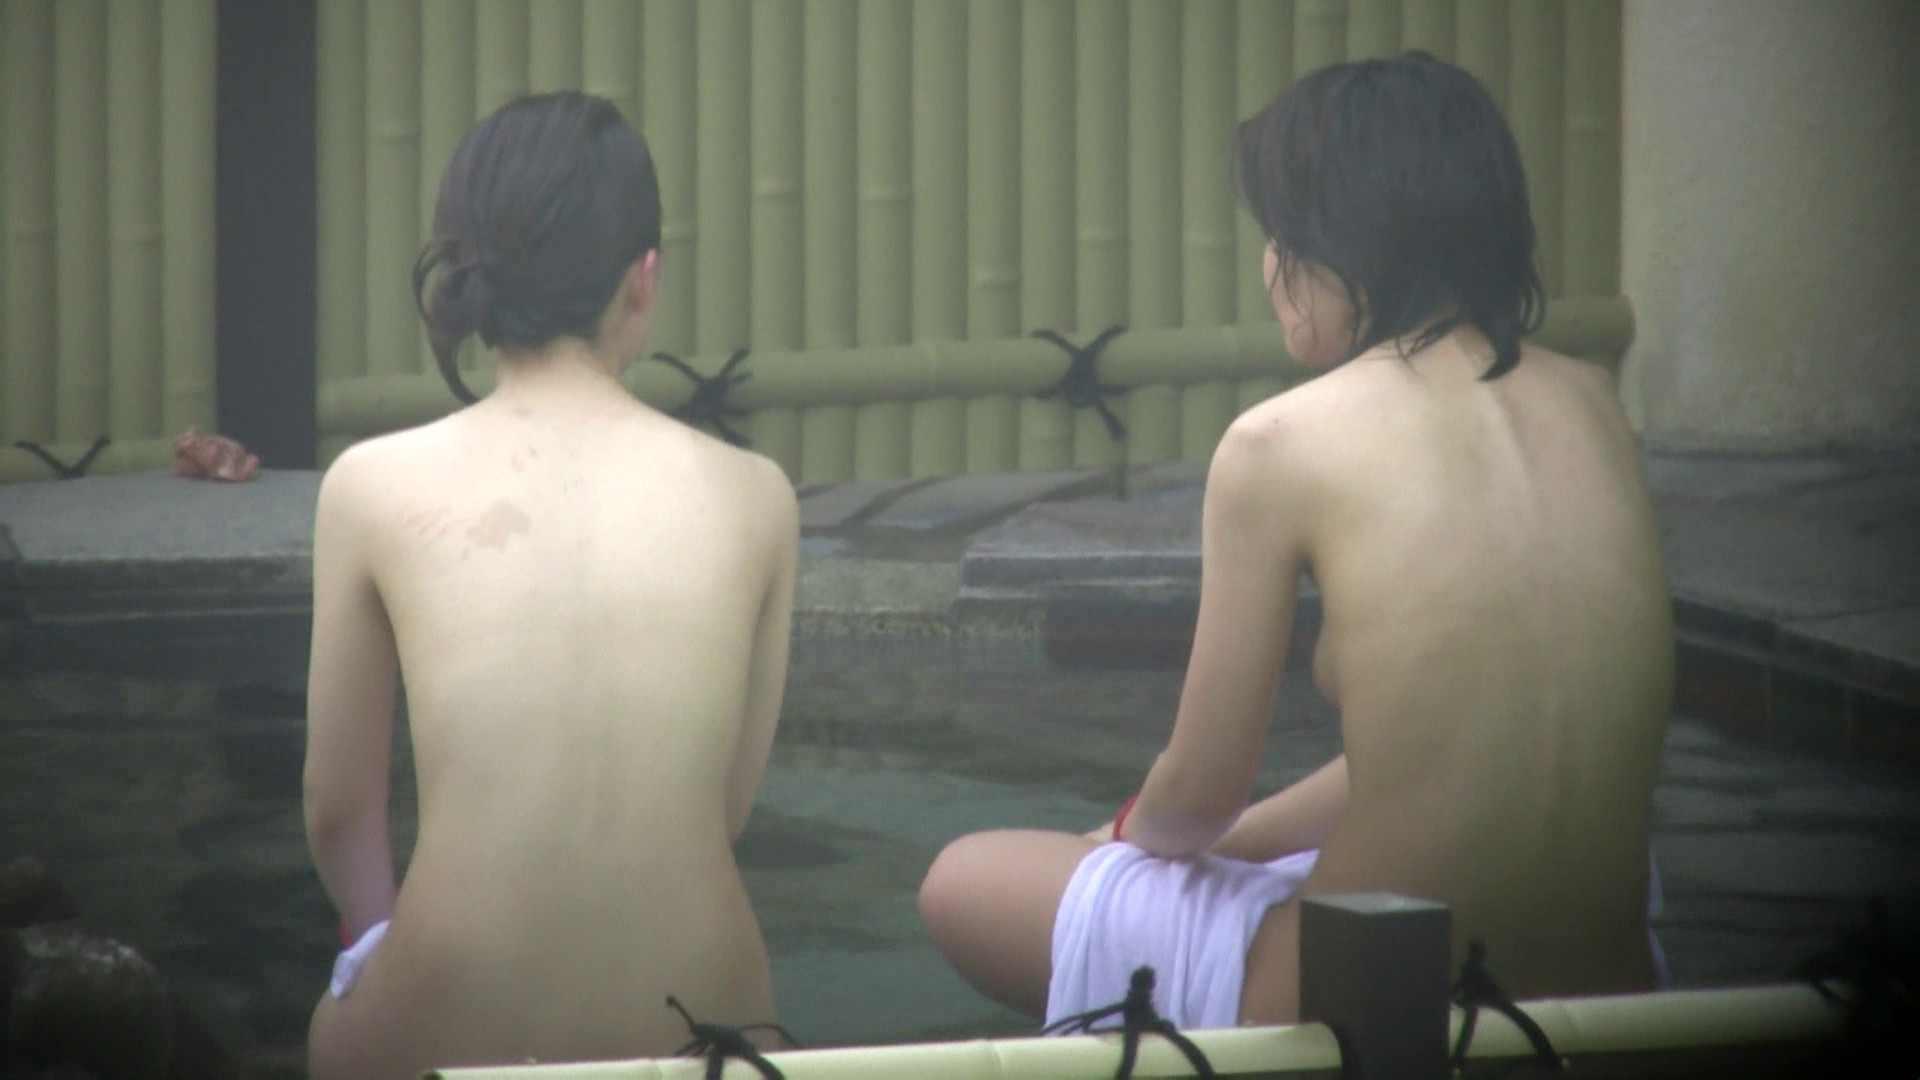 Aquaな露天風呂Vol.583 盗撮 戯れ無修正画像 106枚 101